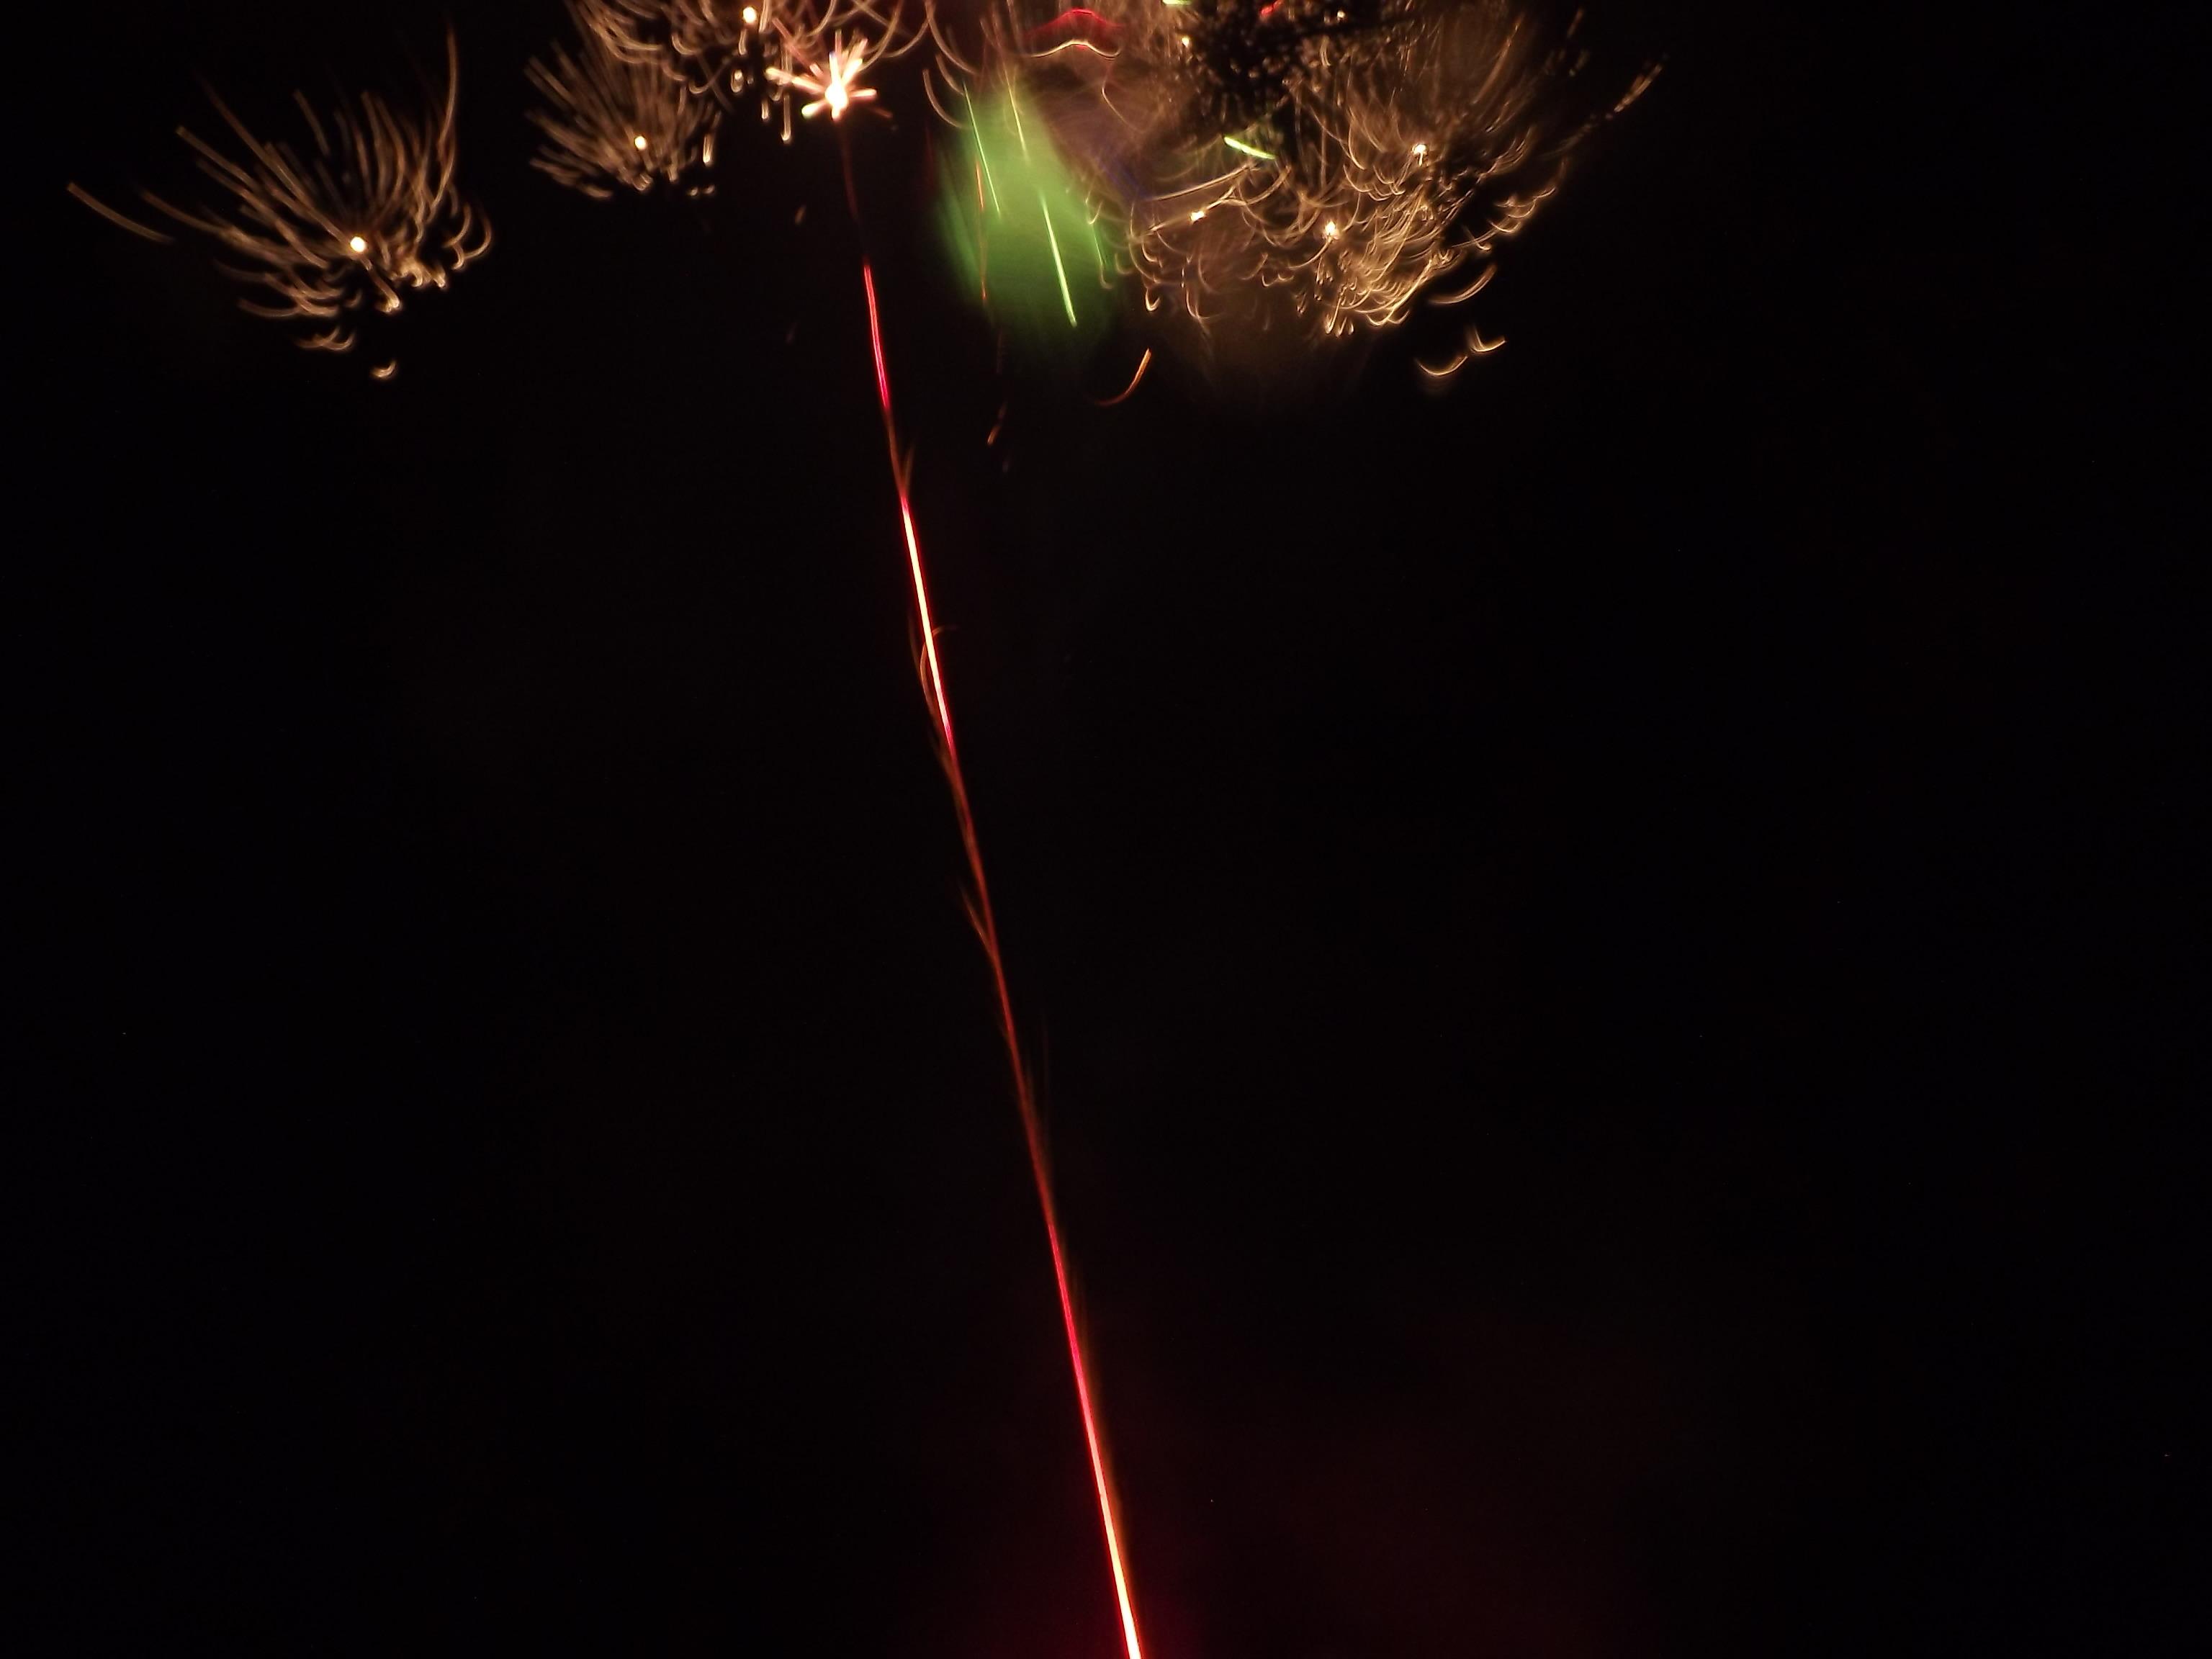 8324-feuerwerk-wolke-explosion